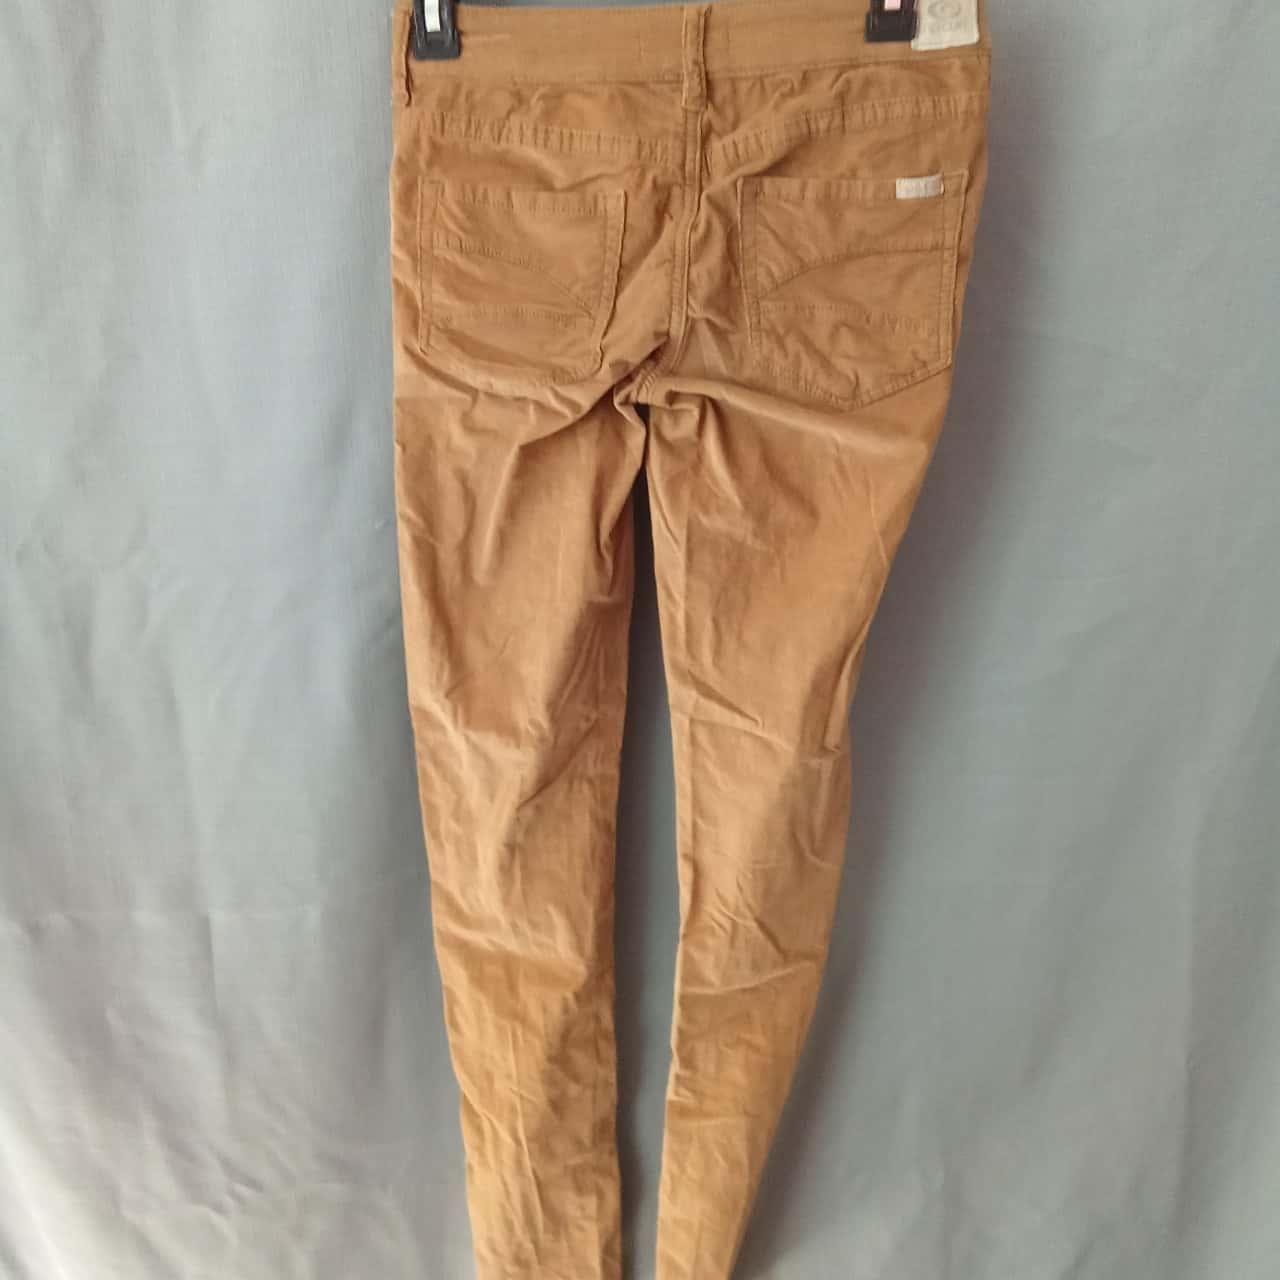 Ripcurl Ladies Beige Pants Size 6 UAF